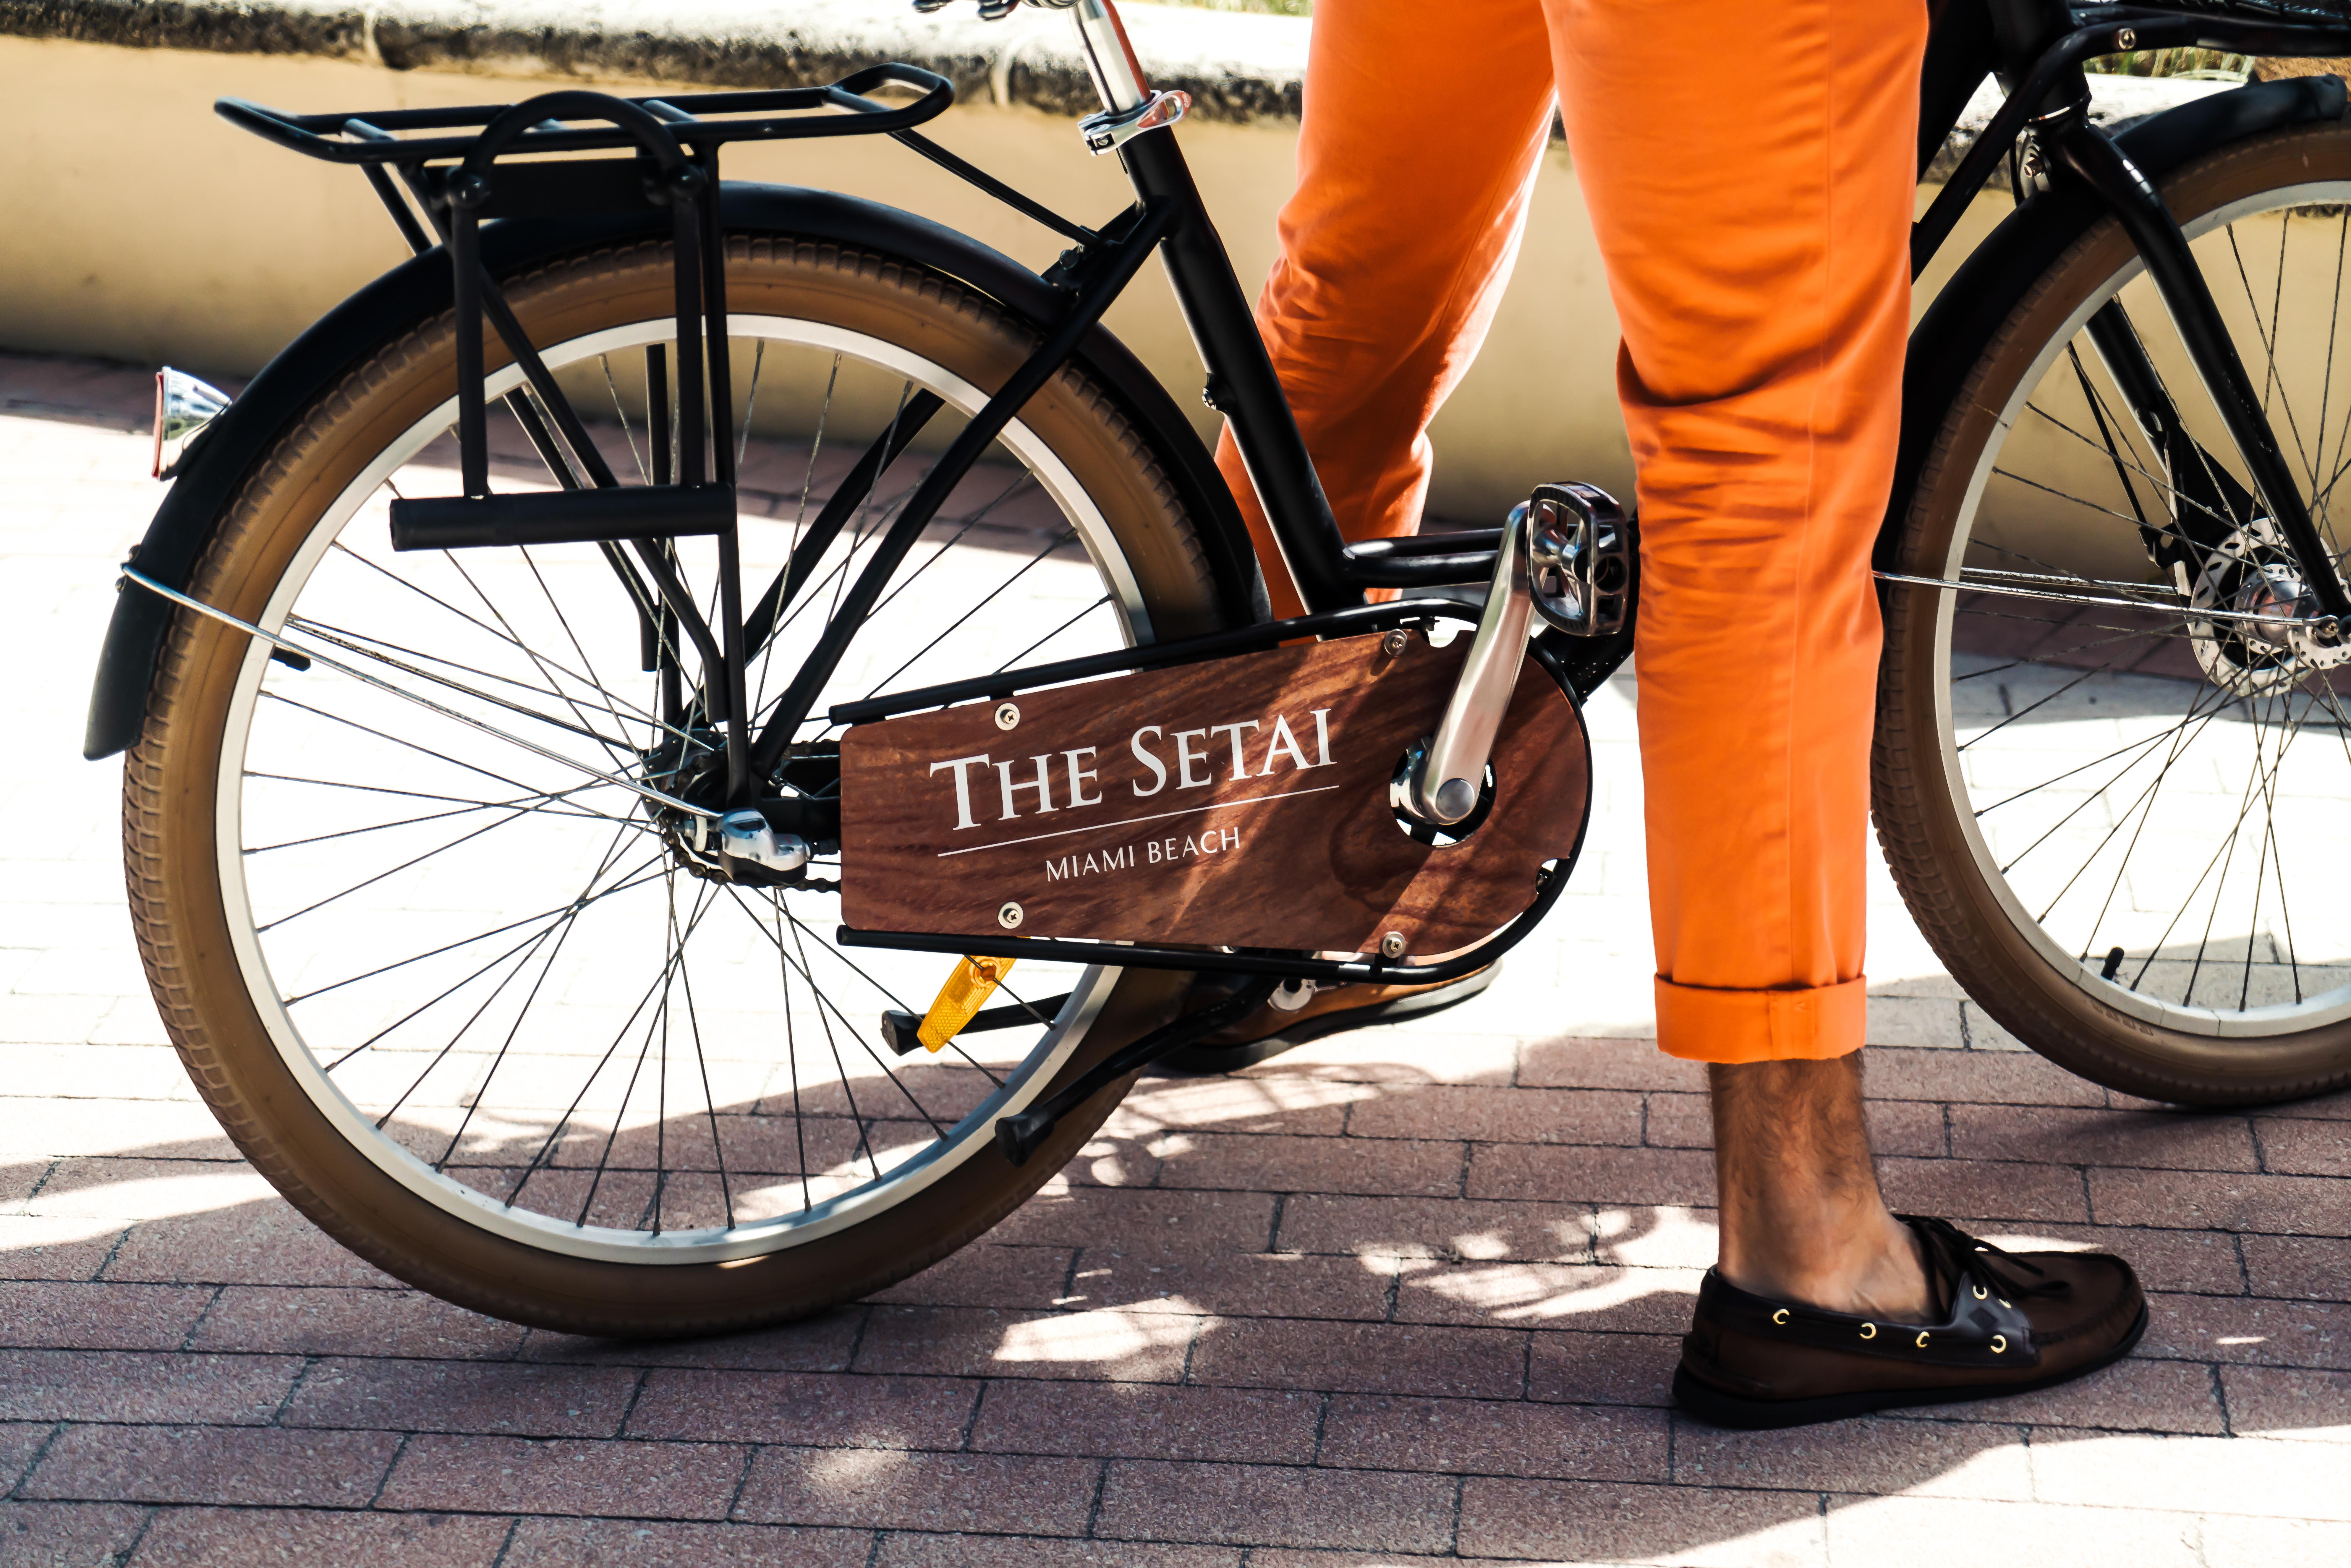 The Setai Hotel Bike, Amenity, Concierge